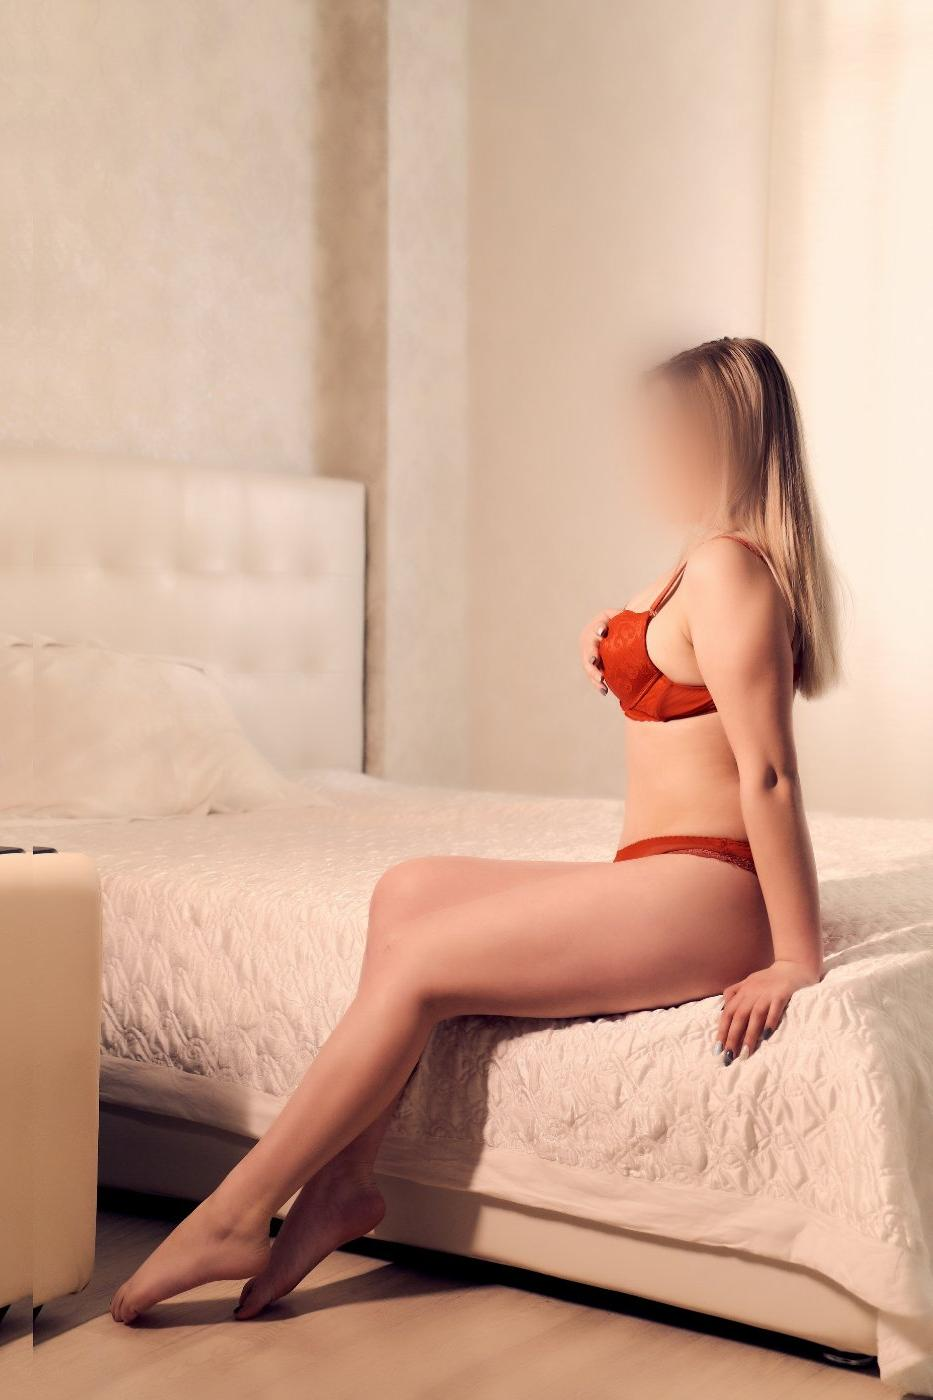 Индивидуалка Марина, 35 лет, метро Коломенская